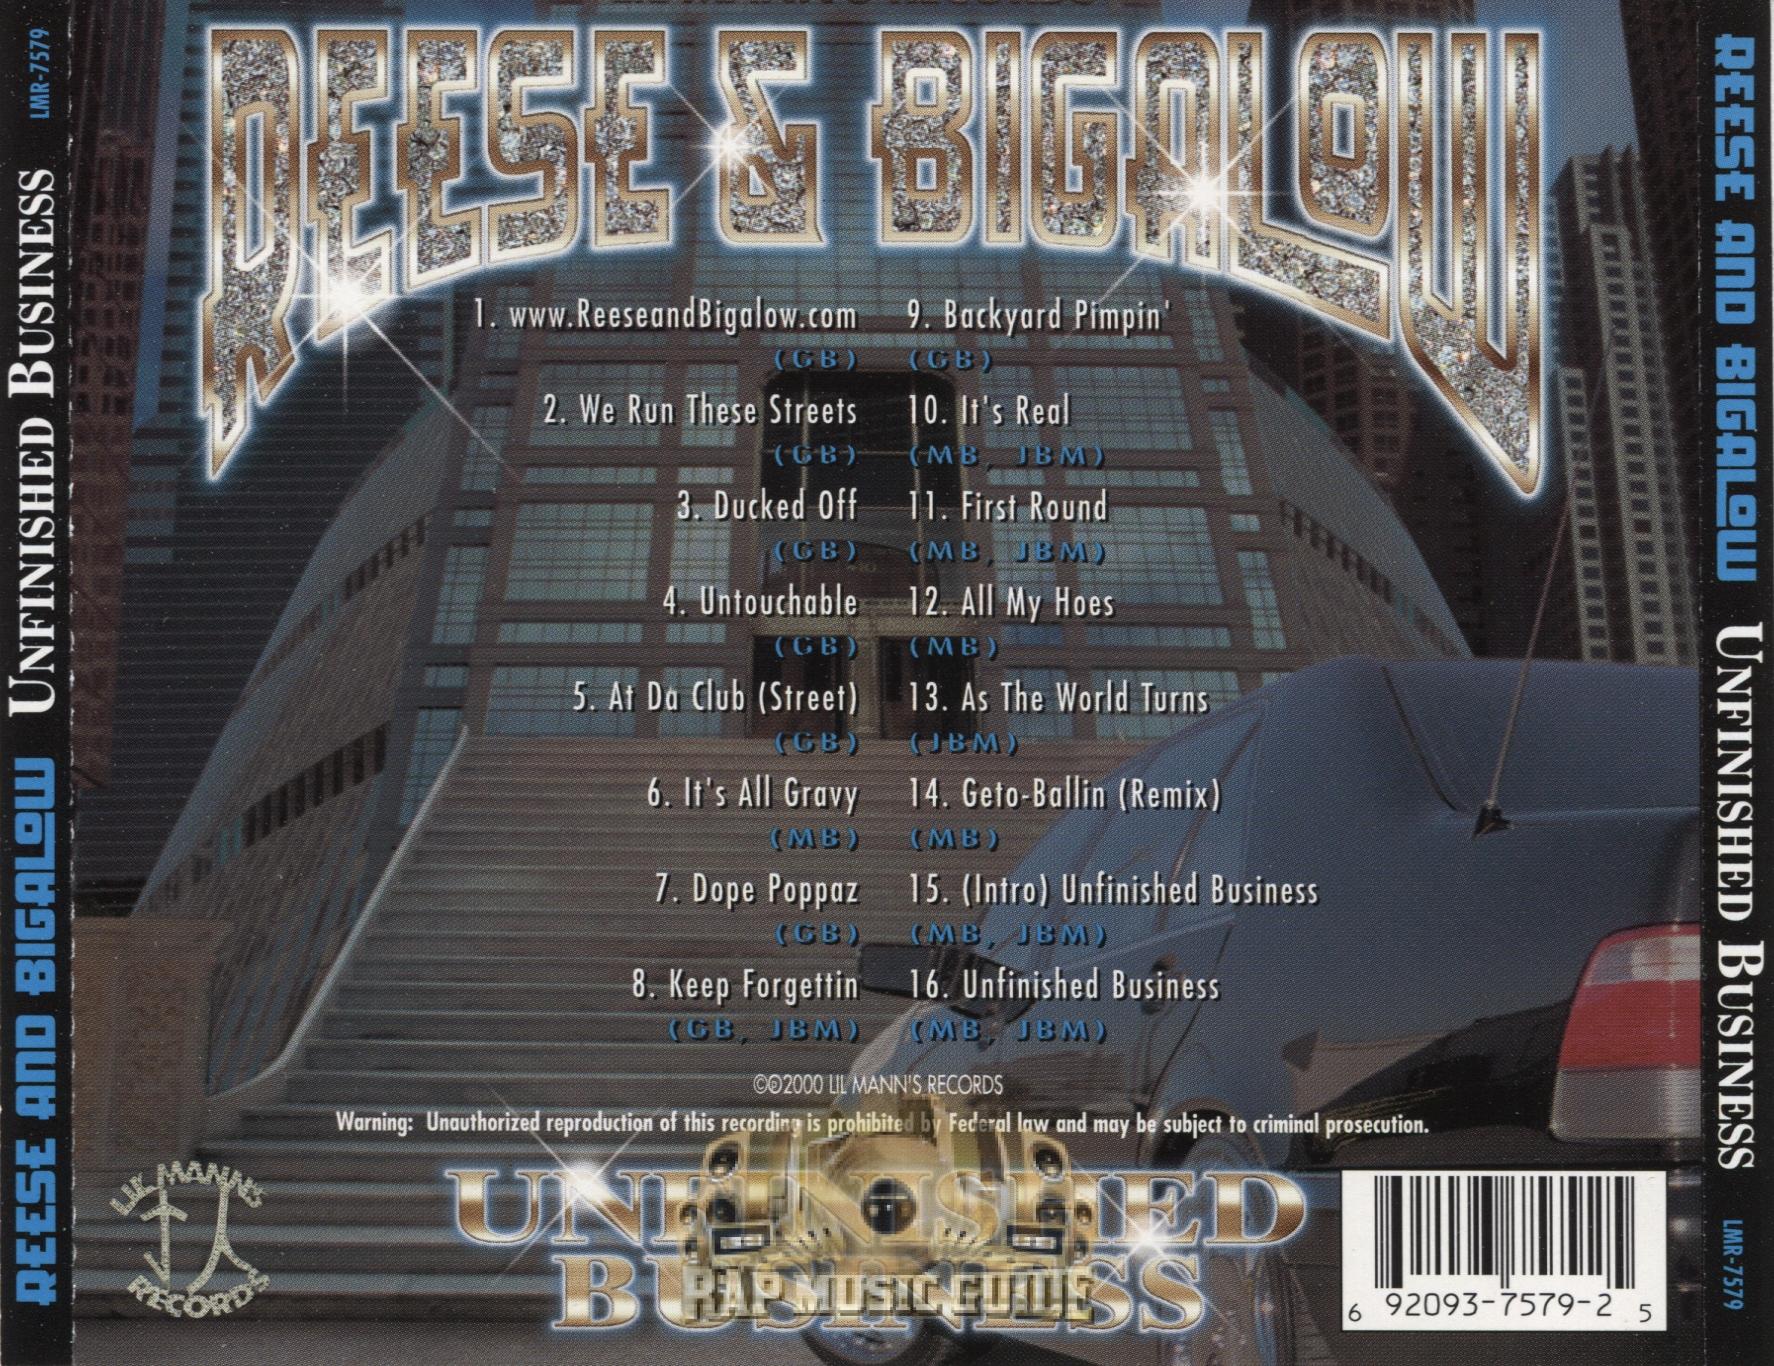 reese u0026 bigelow unfinished business cd rap music guide